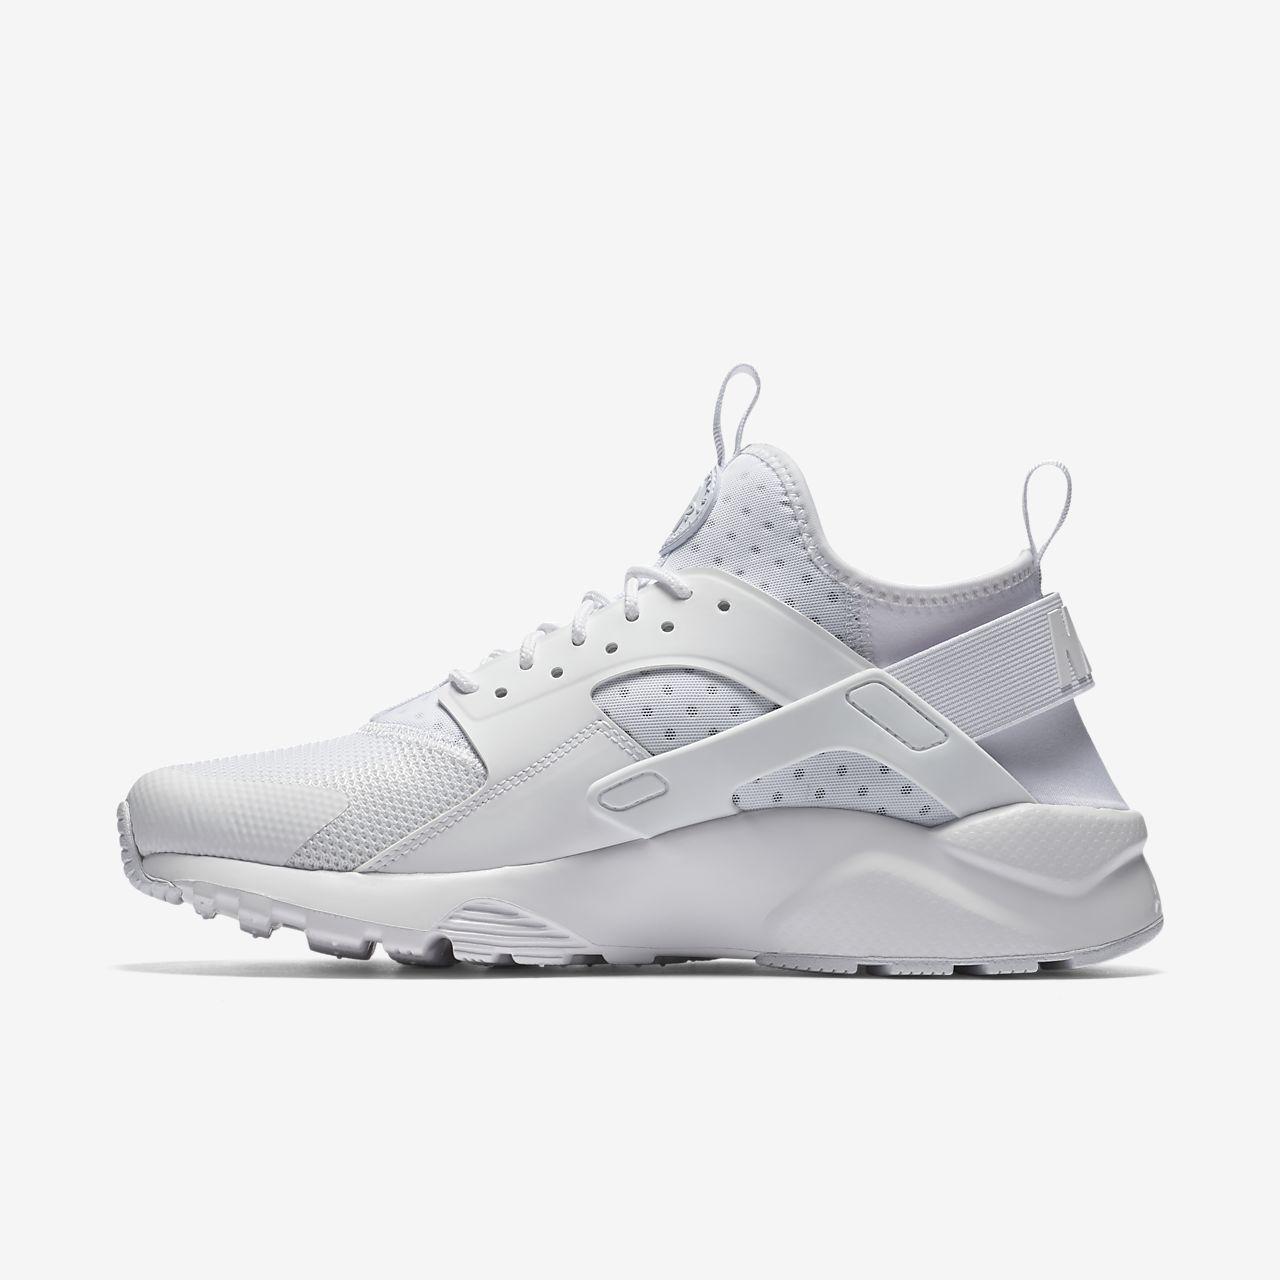 ... Nike Air Huarache Ultra Erkek Ayakkabısı